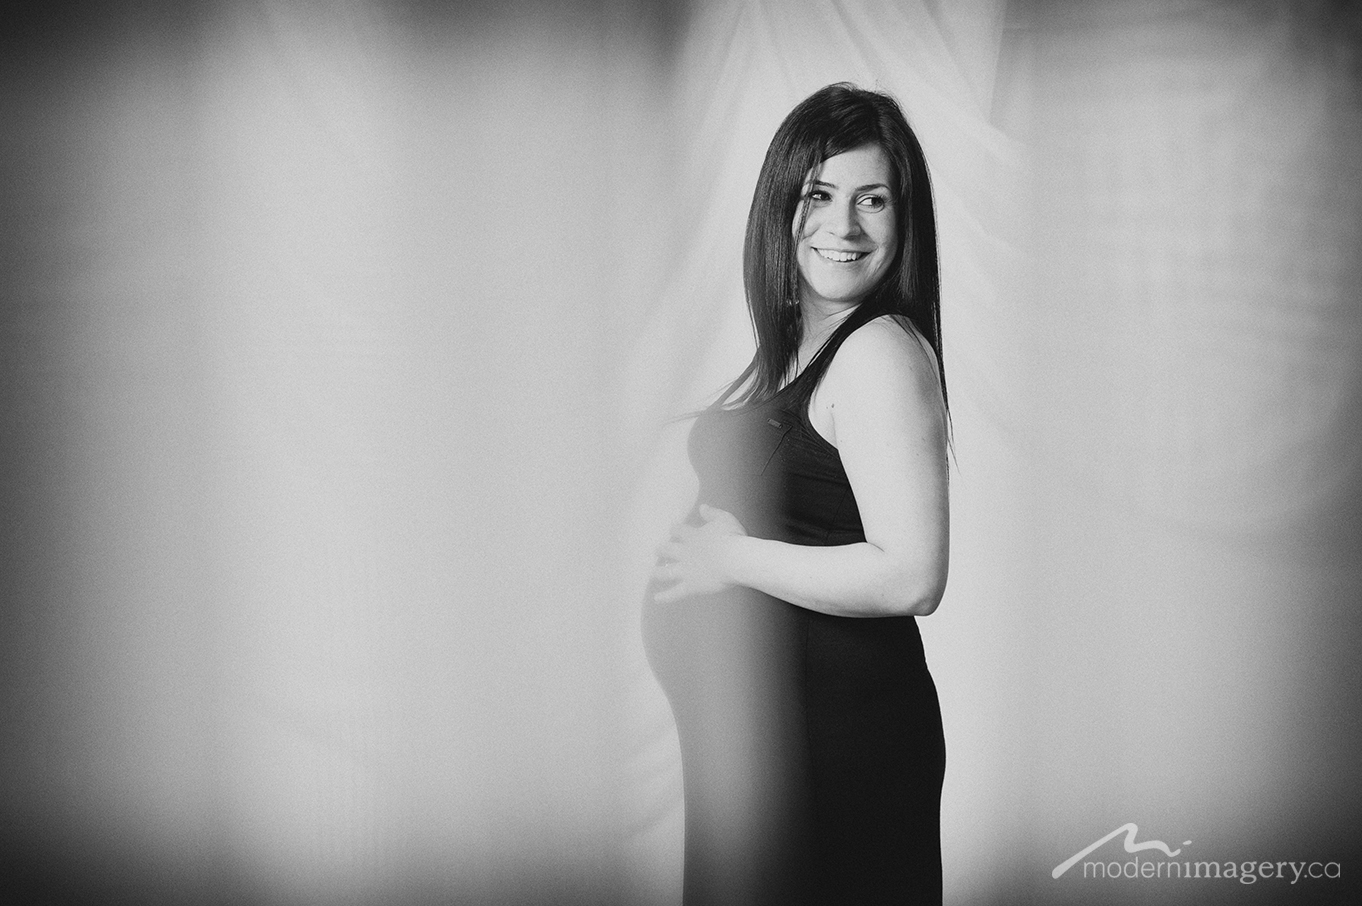 Christina&Rui_Maternity-17.jpg